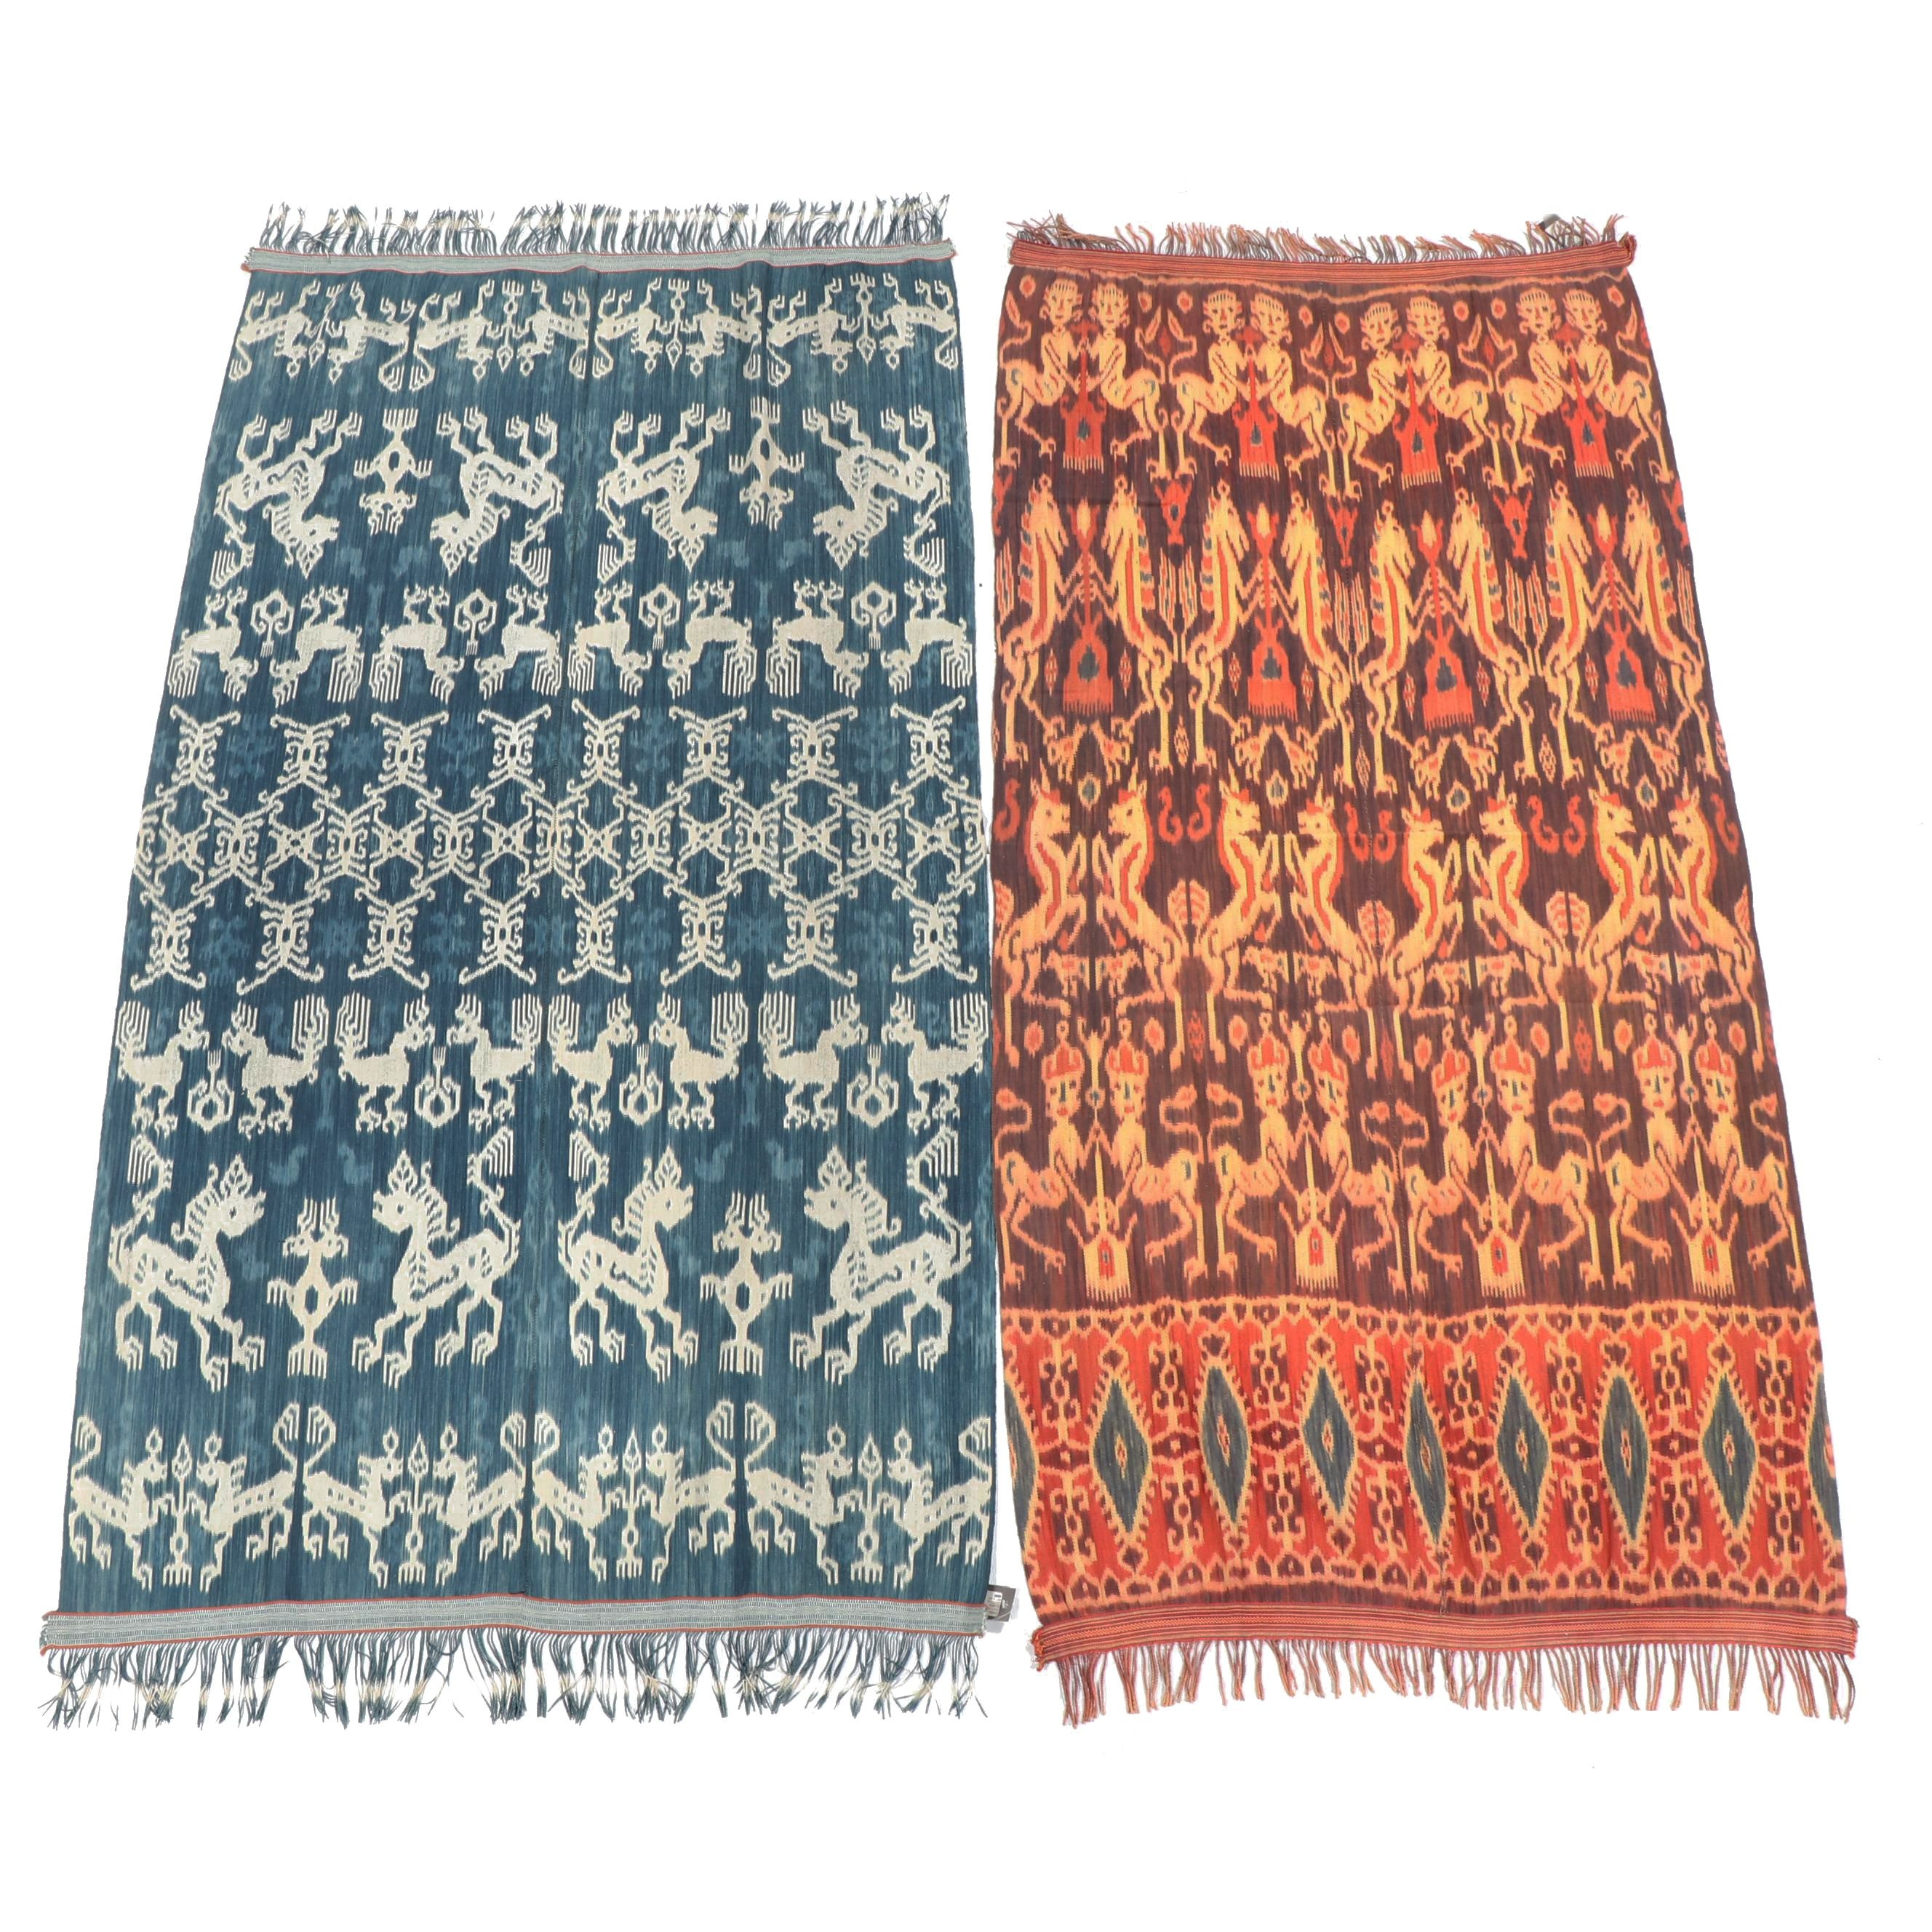 Handwoven Indonesian Pictorial Ikat Cotton Textiles